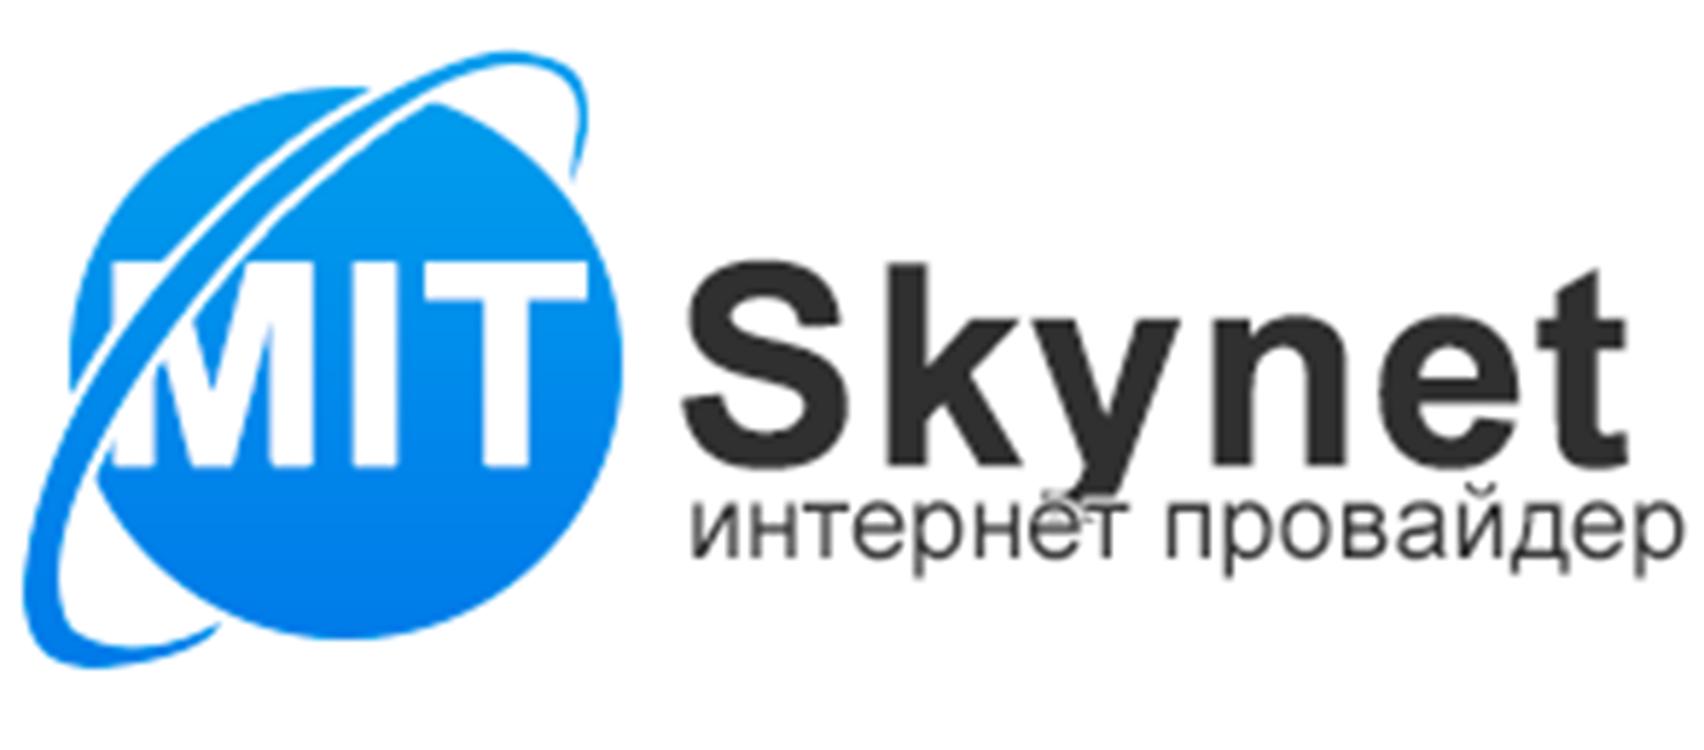 MIT SkyNet